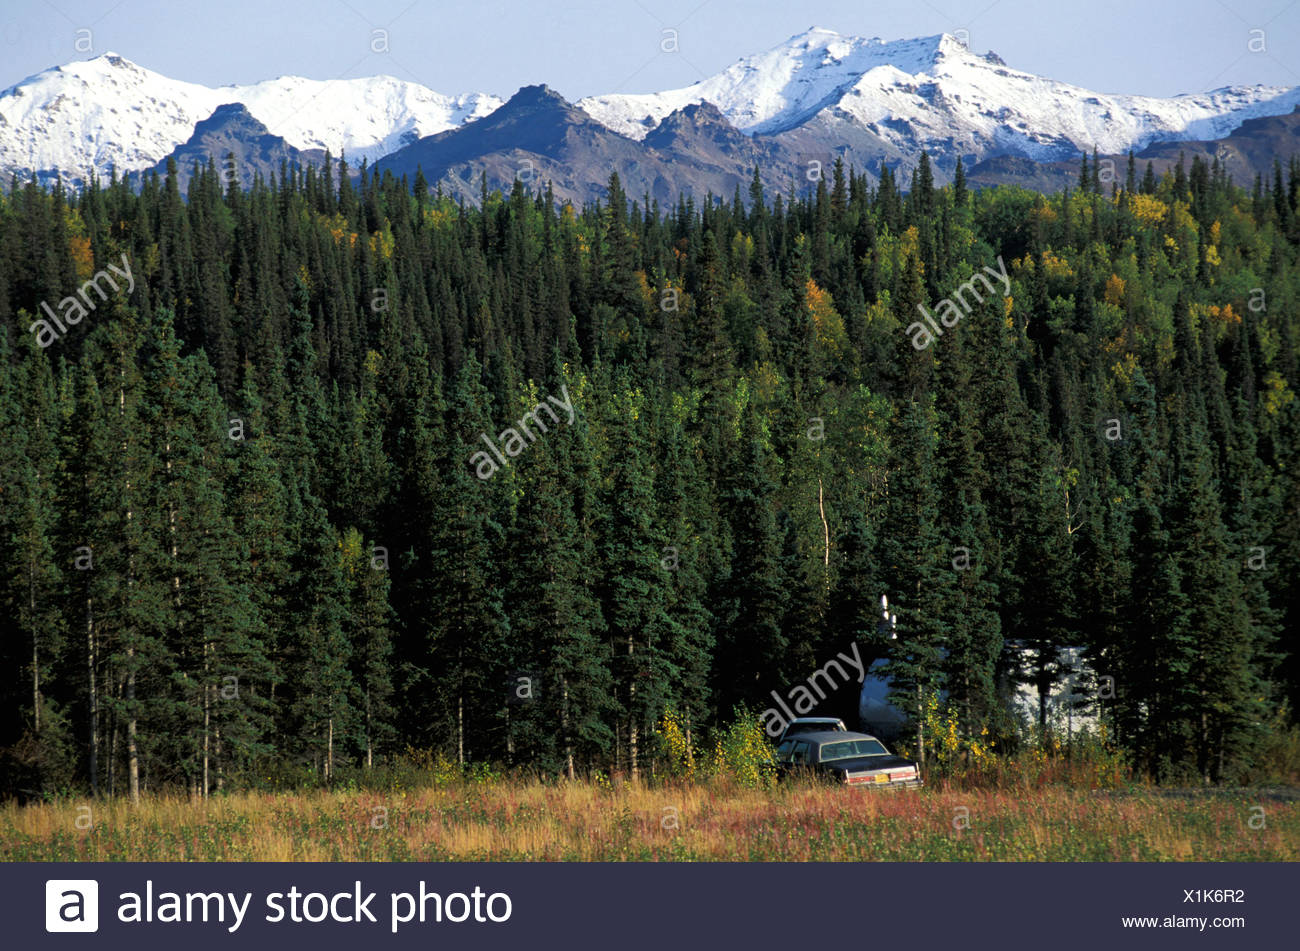 Healy, Alaska, USA, üppigen Wald, Berg, sonnig, Herbst, Farben, camping, Camp, Wald, Hain Stockbild